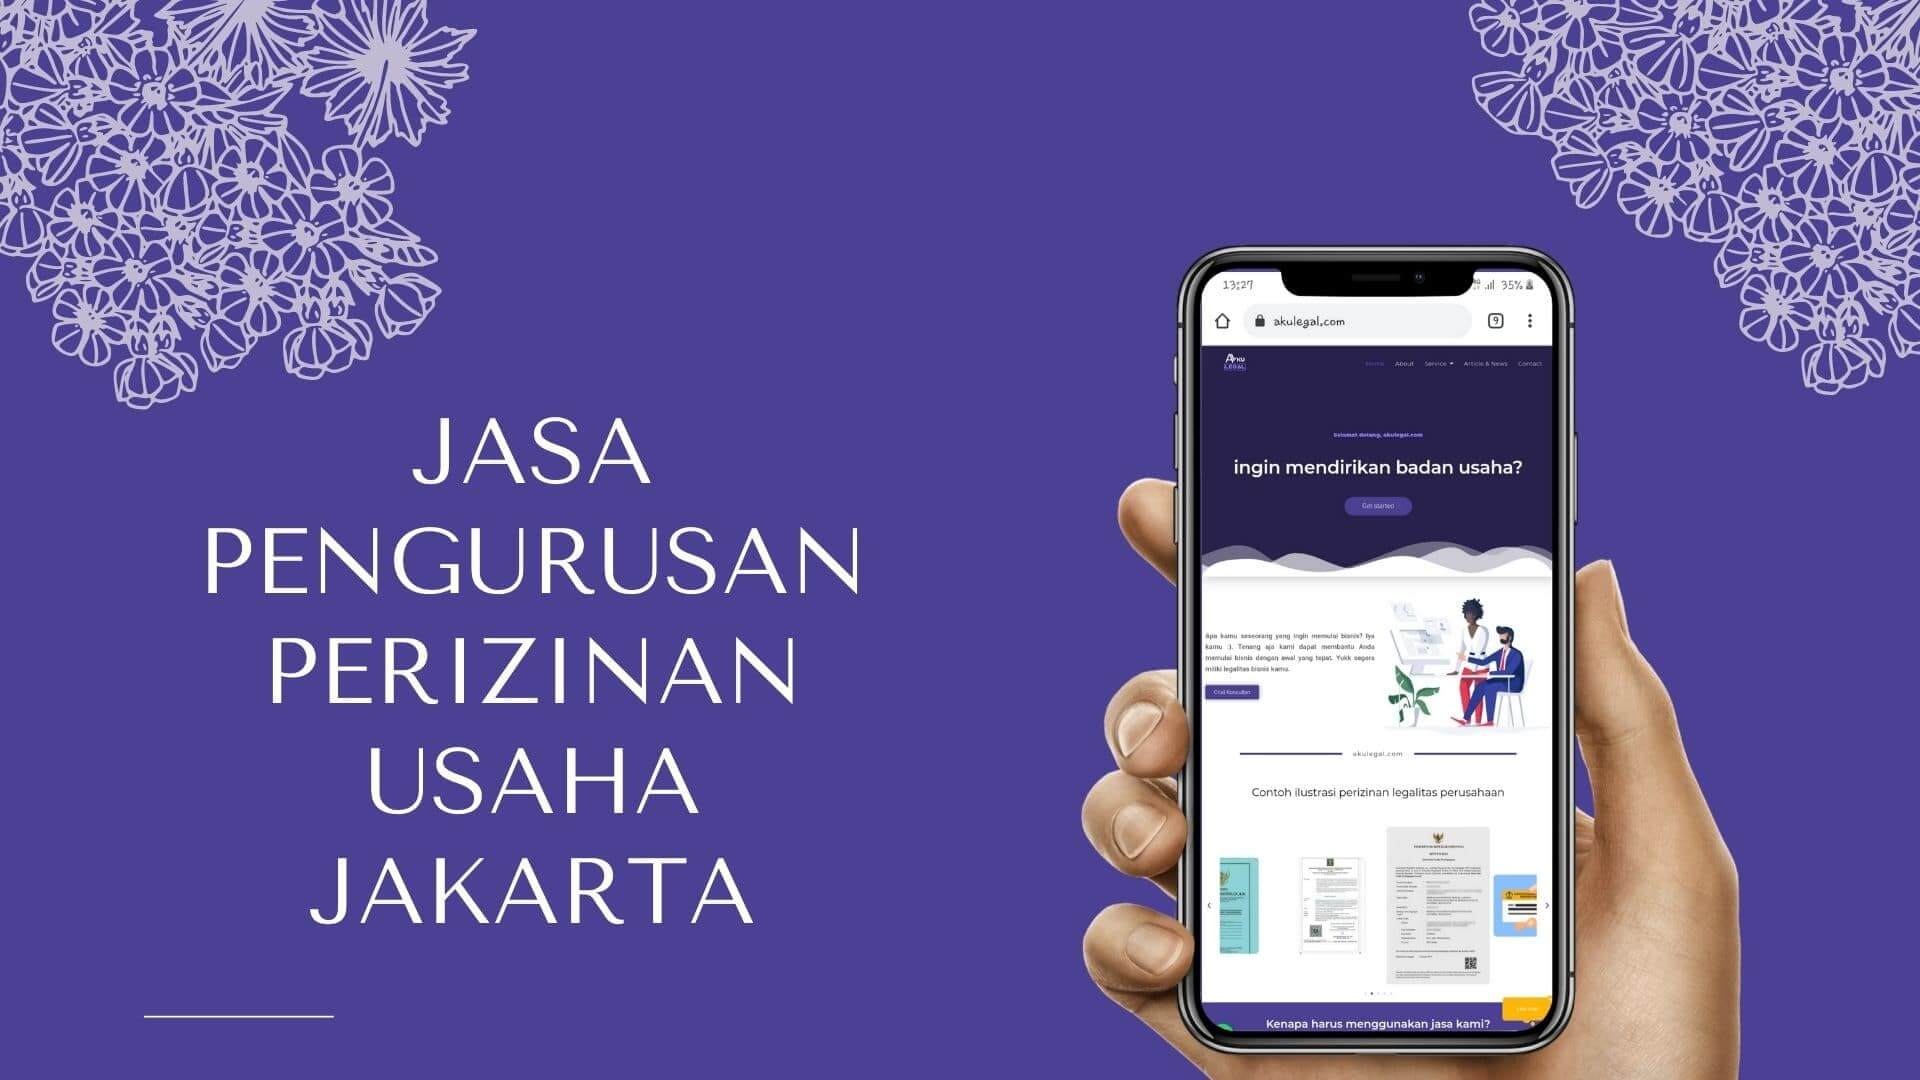 Jasa Pengurusan Perizinan Usaha Jakarta